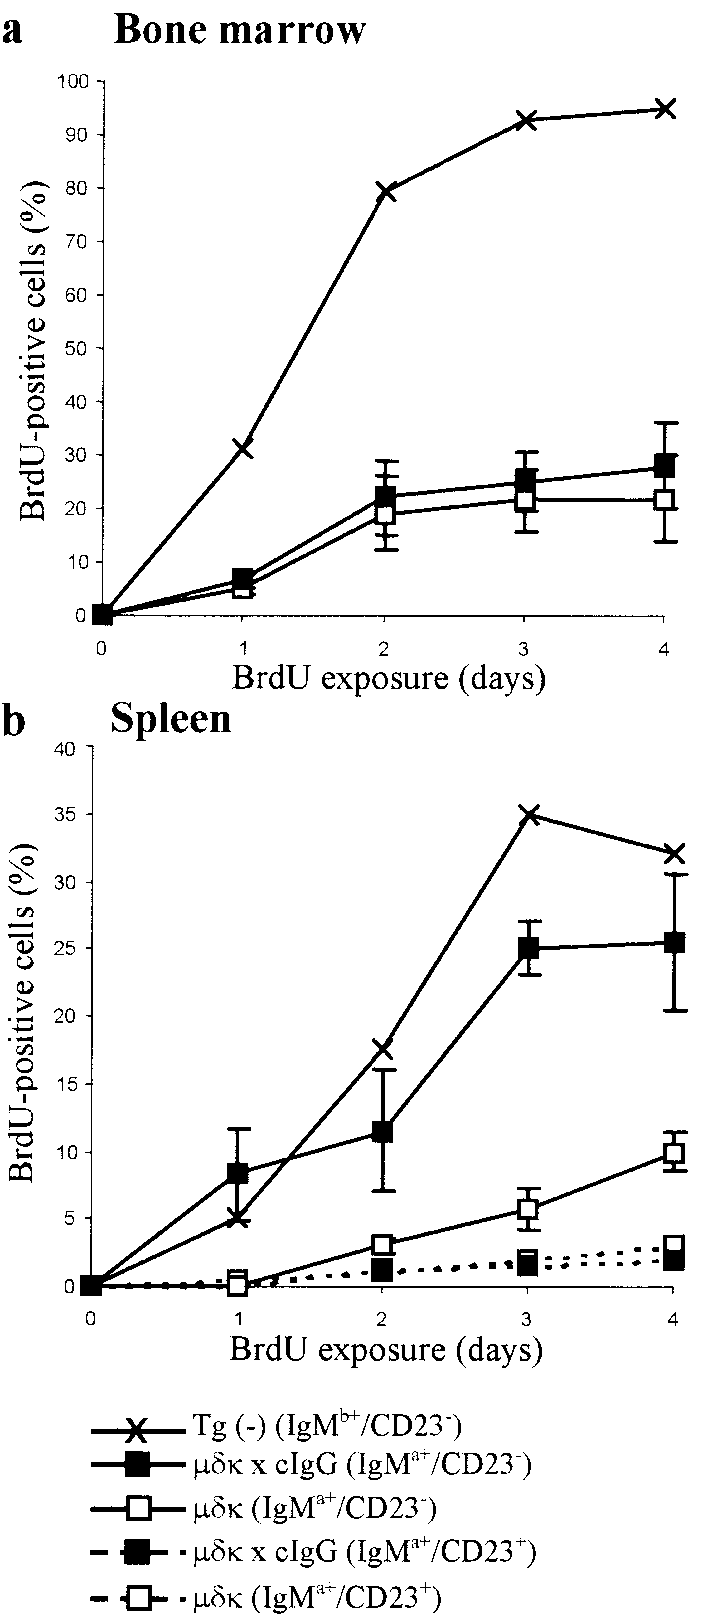 hight resolution of kinetics of brdu labeling of b lymphocytes of naab cigg mice in bone marrow a